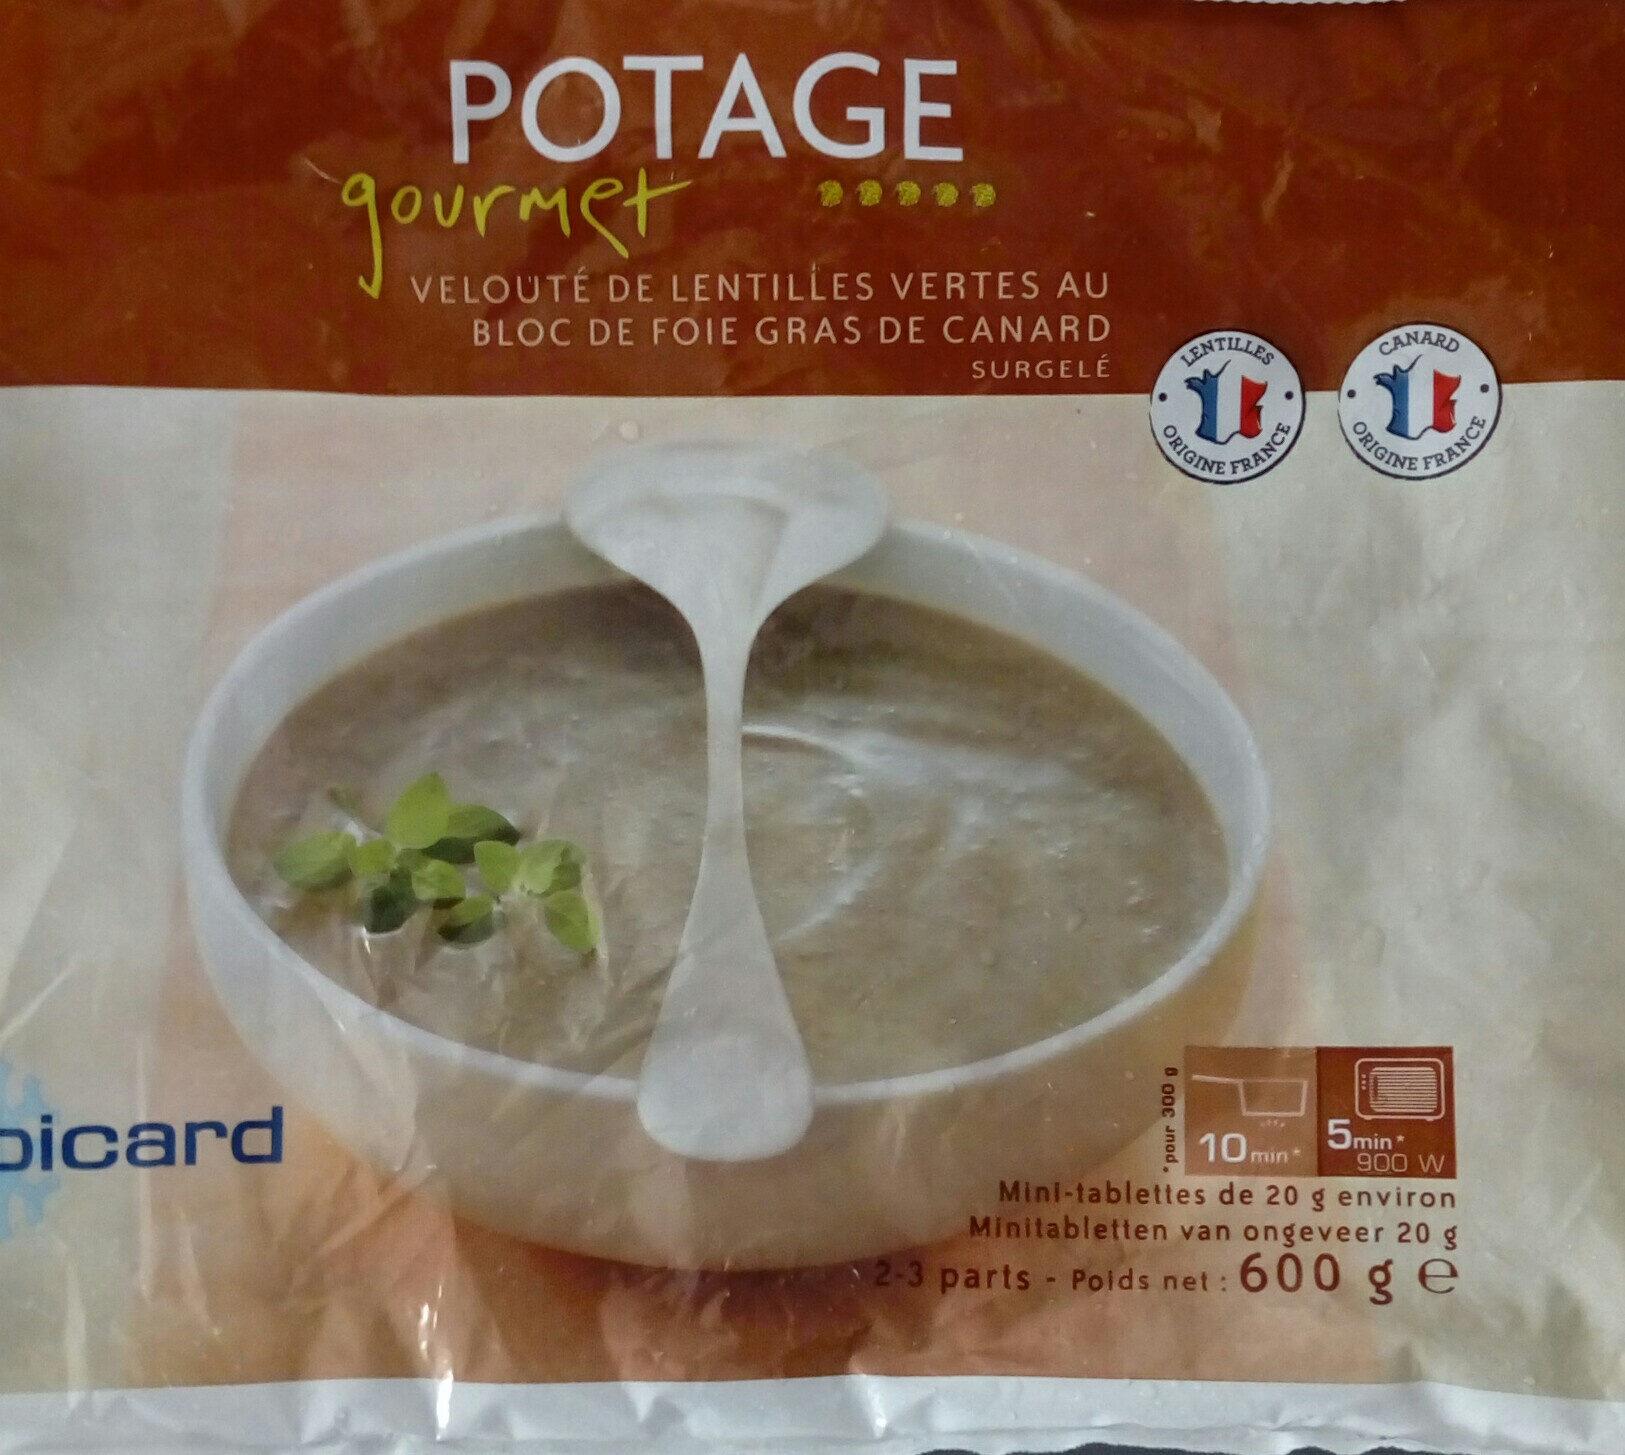 Potage gourmet - Produit - fr